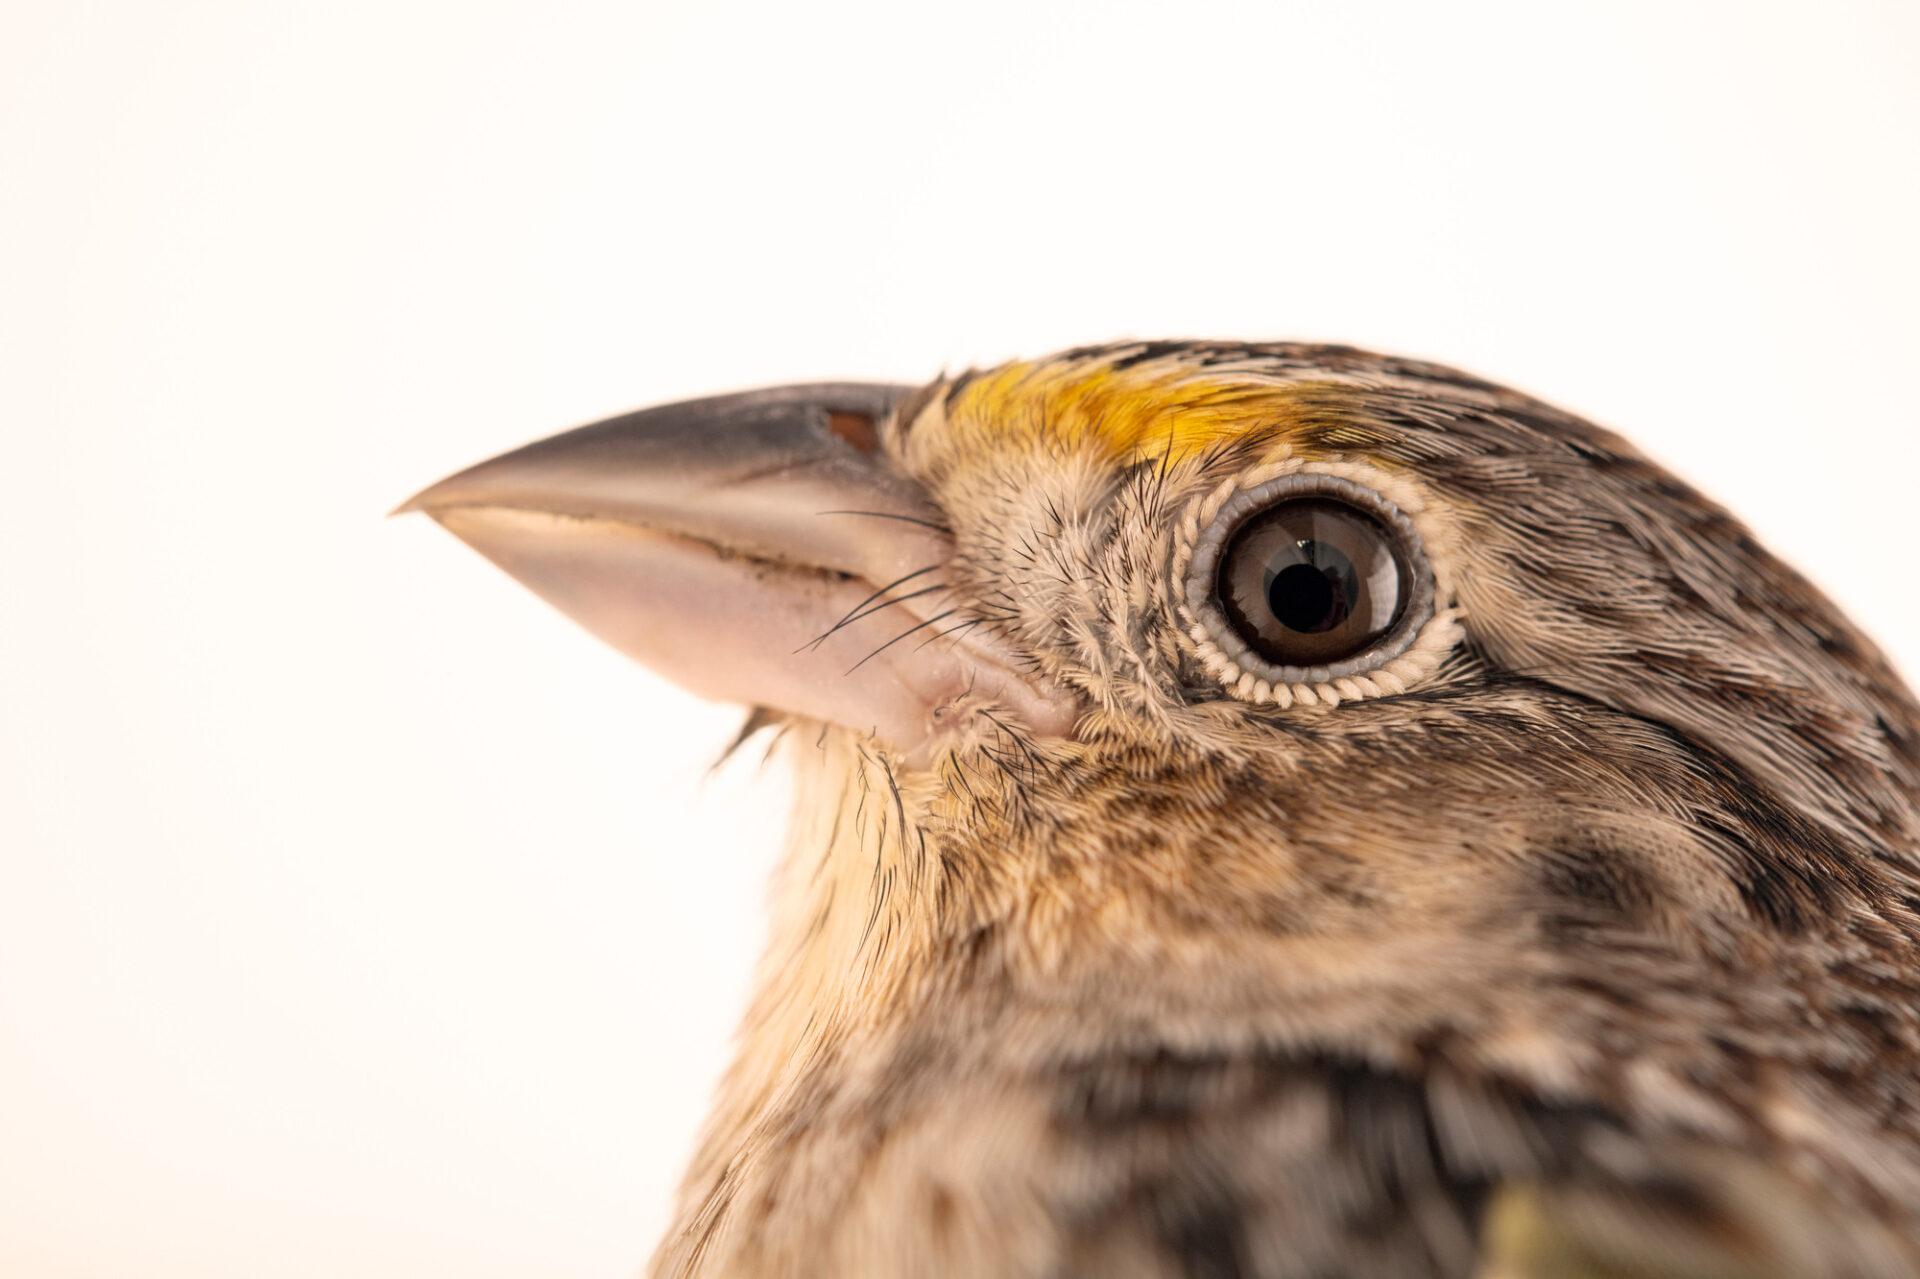 Photo: A Florida grasshopper sparrow (Ammodramus savannarum floridanus) at White Oak Conservation Center, Yulee, Florida.